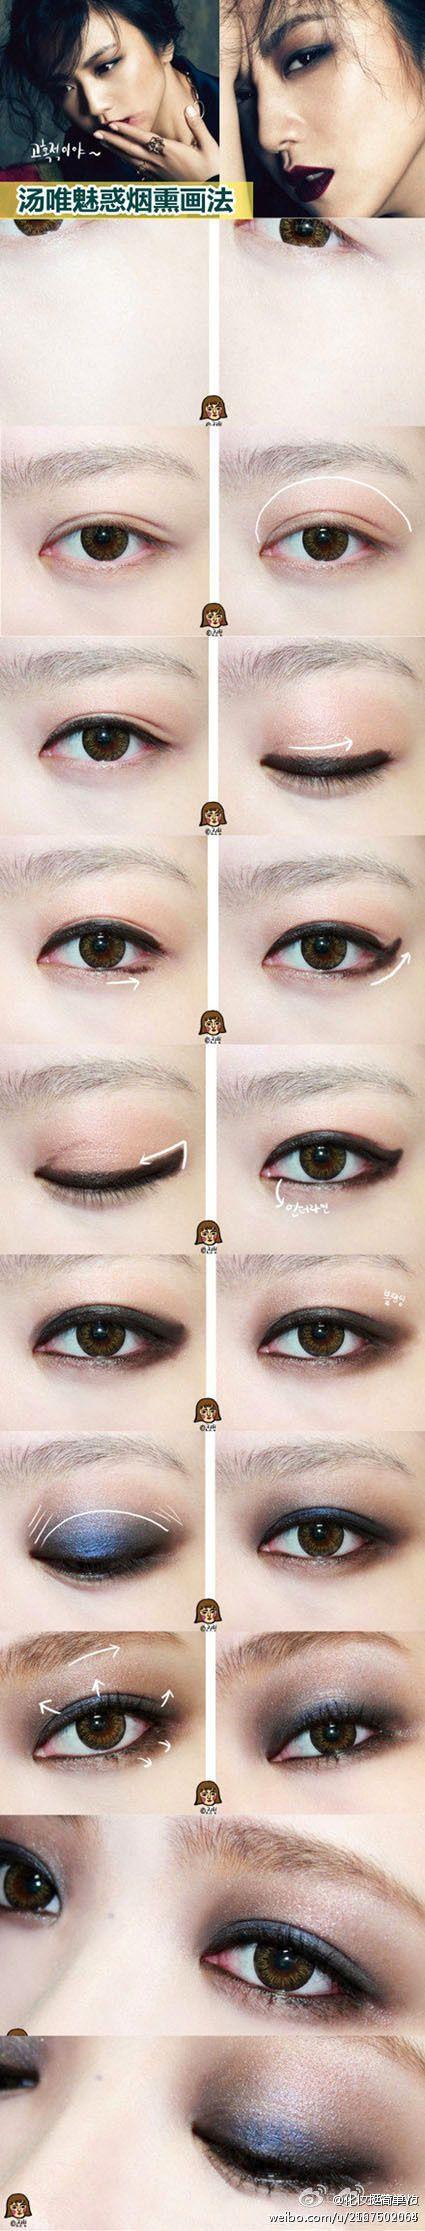 Japanese make up tutorial asianskincarecks make up smoky eye tutorial for asian hooded eyes baditri Image collections